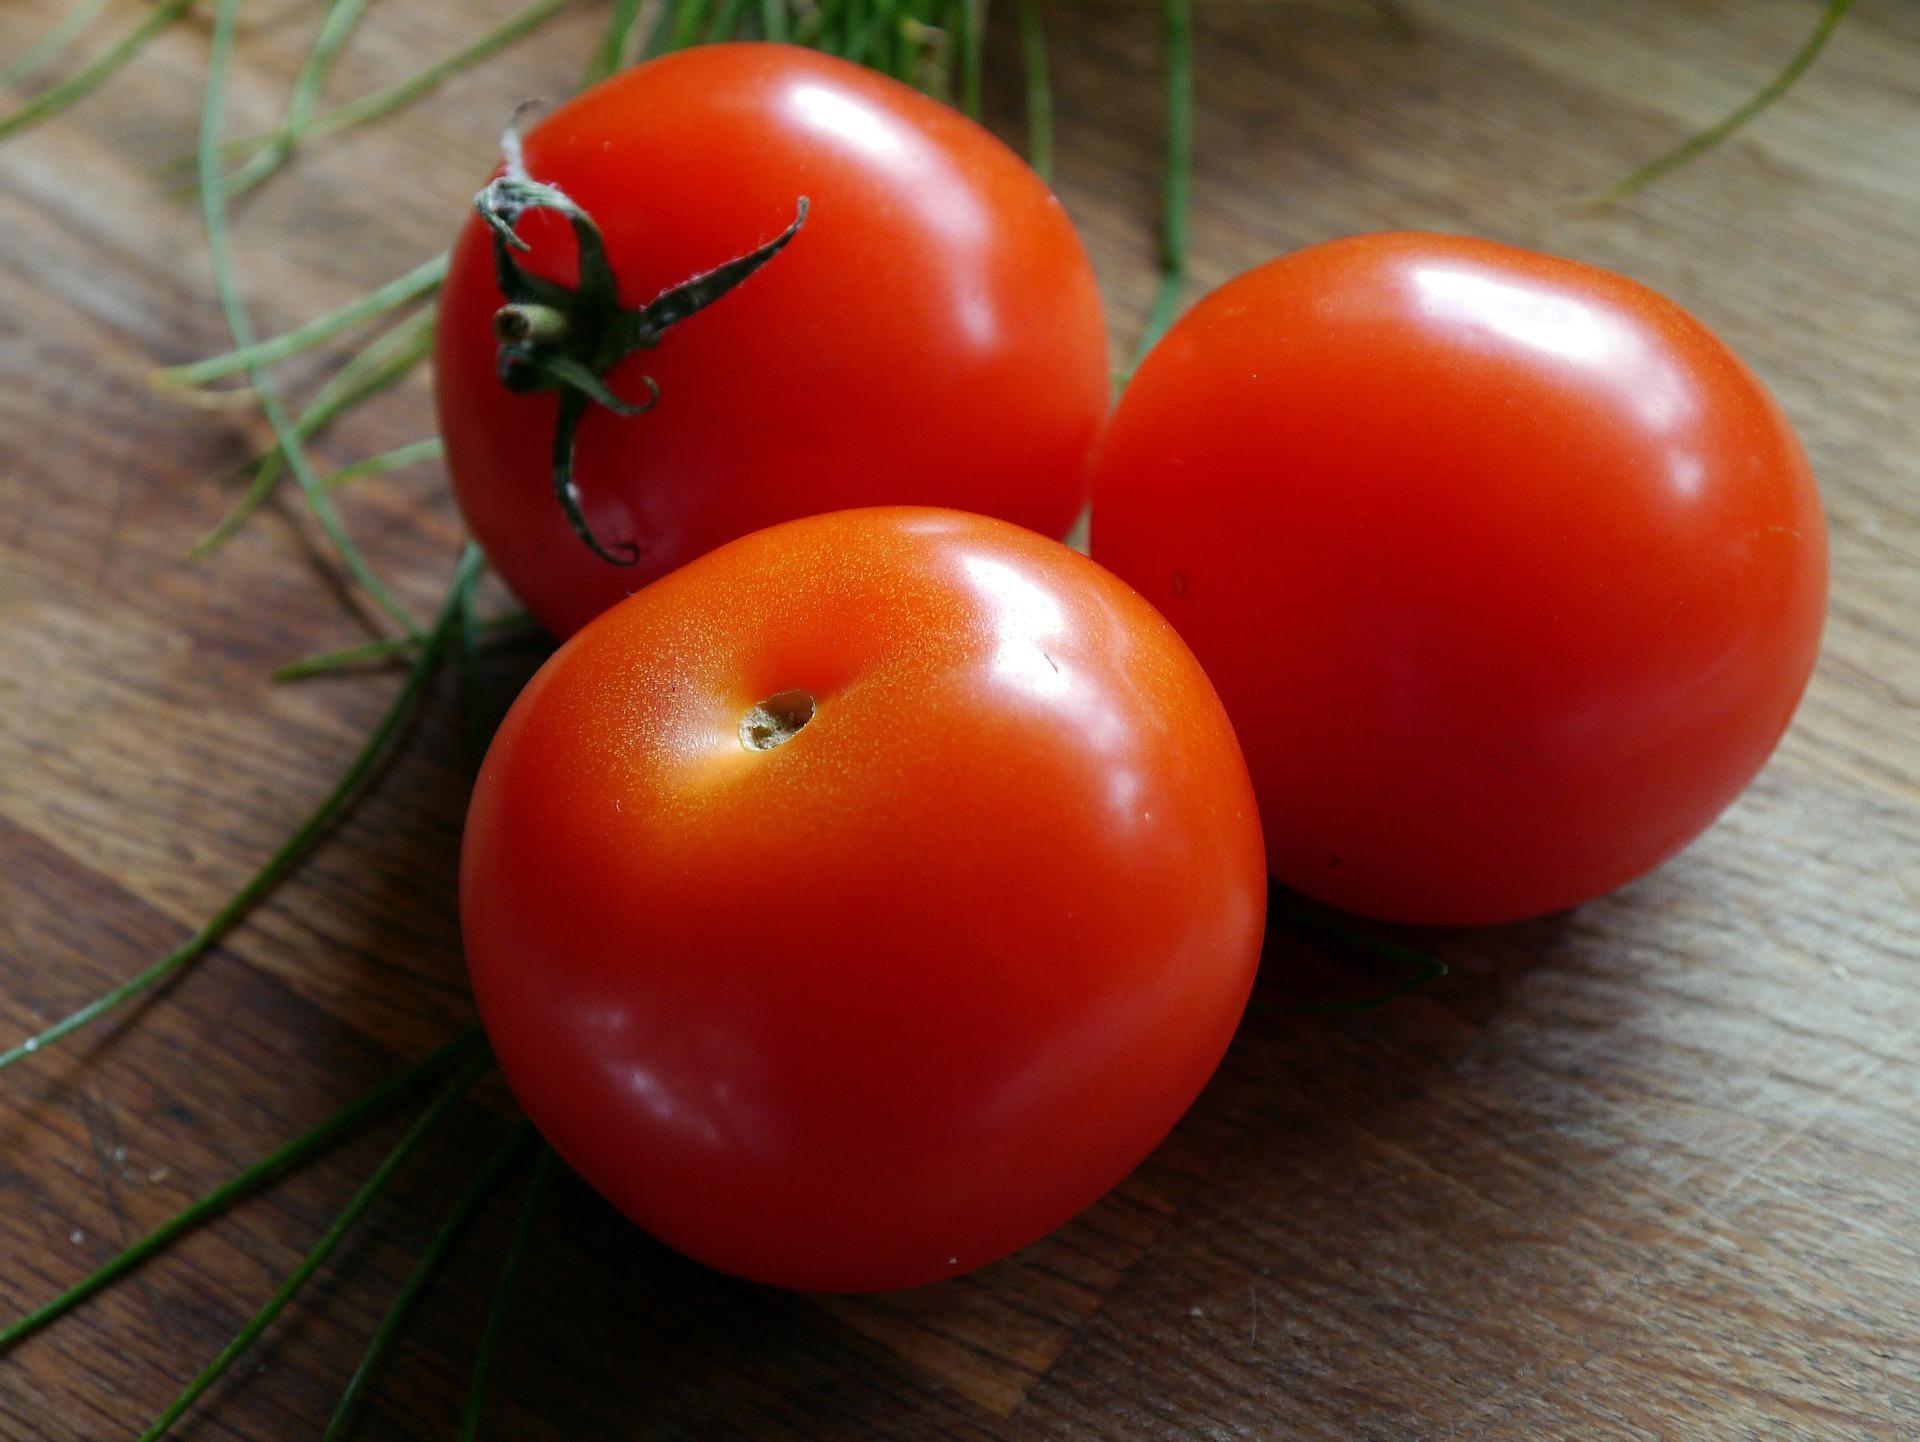 three red tomatoes